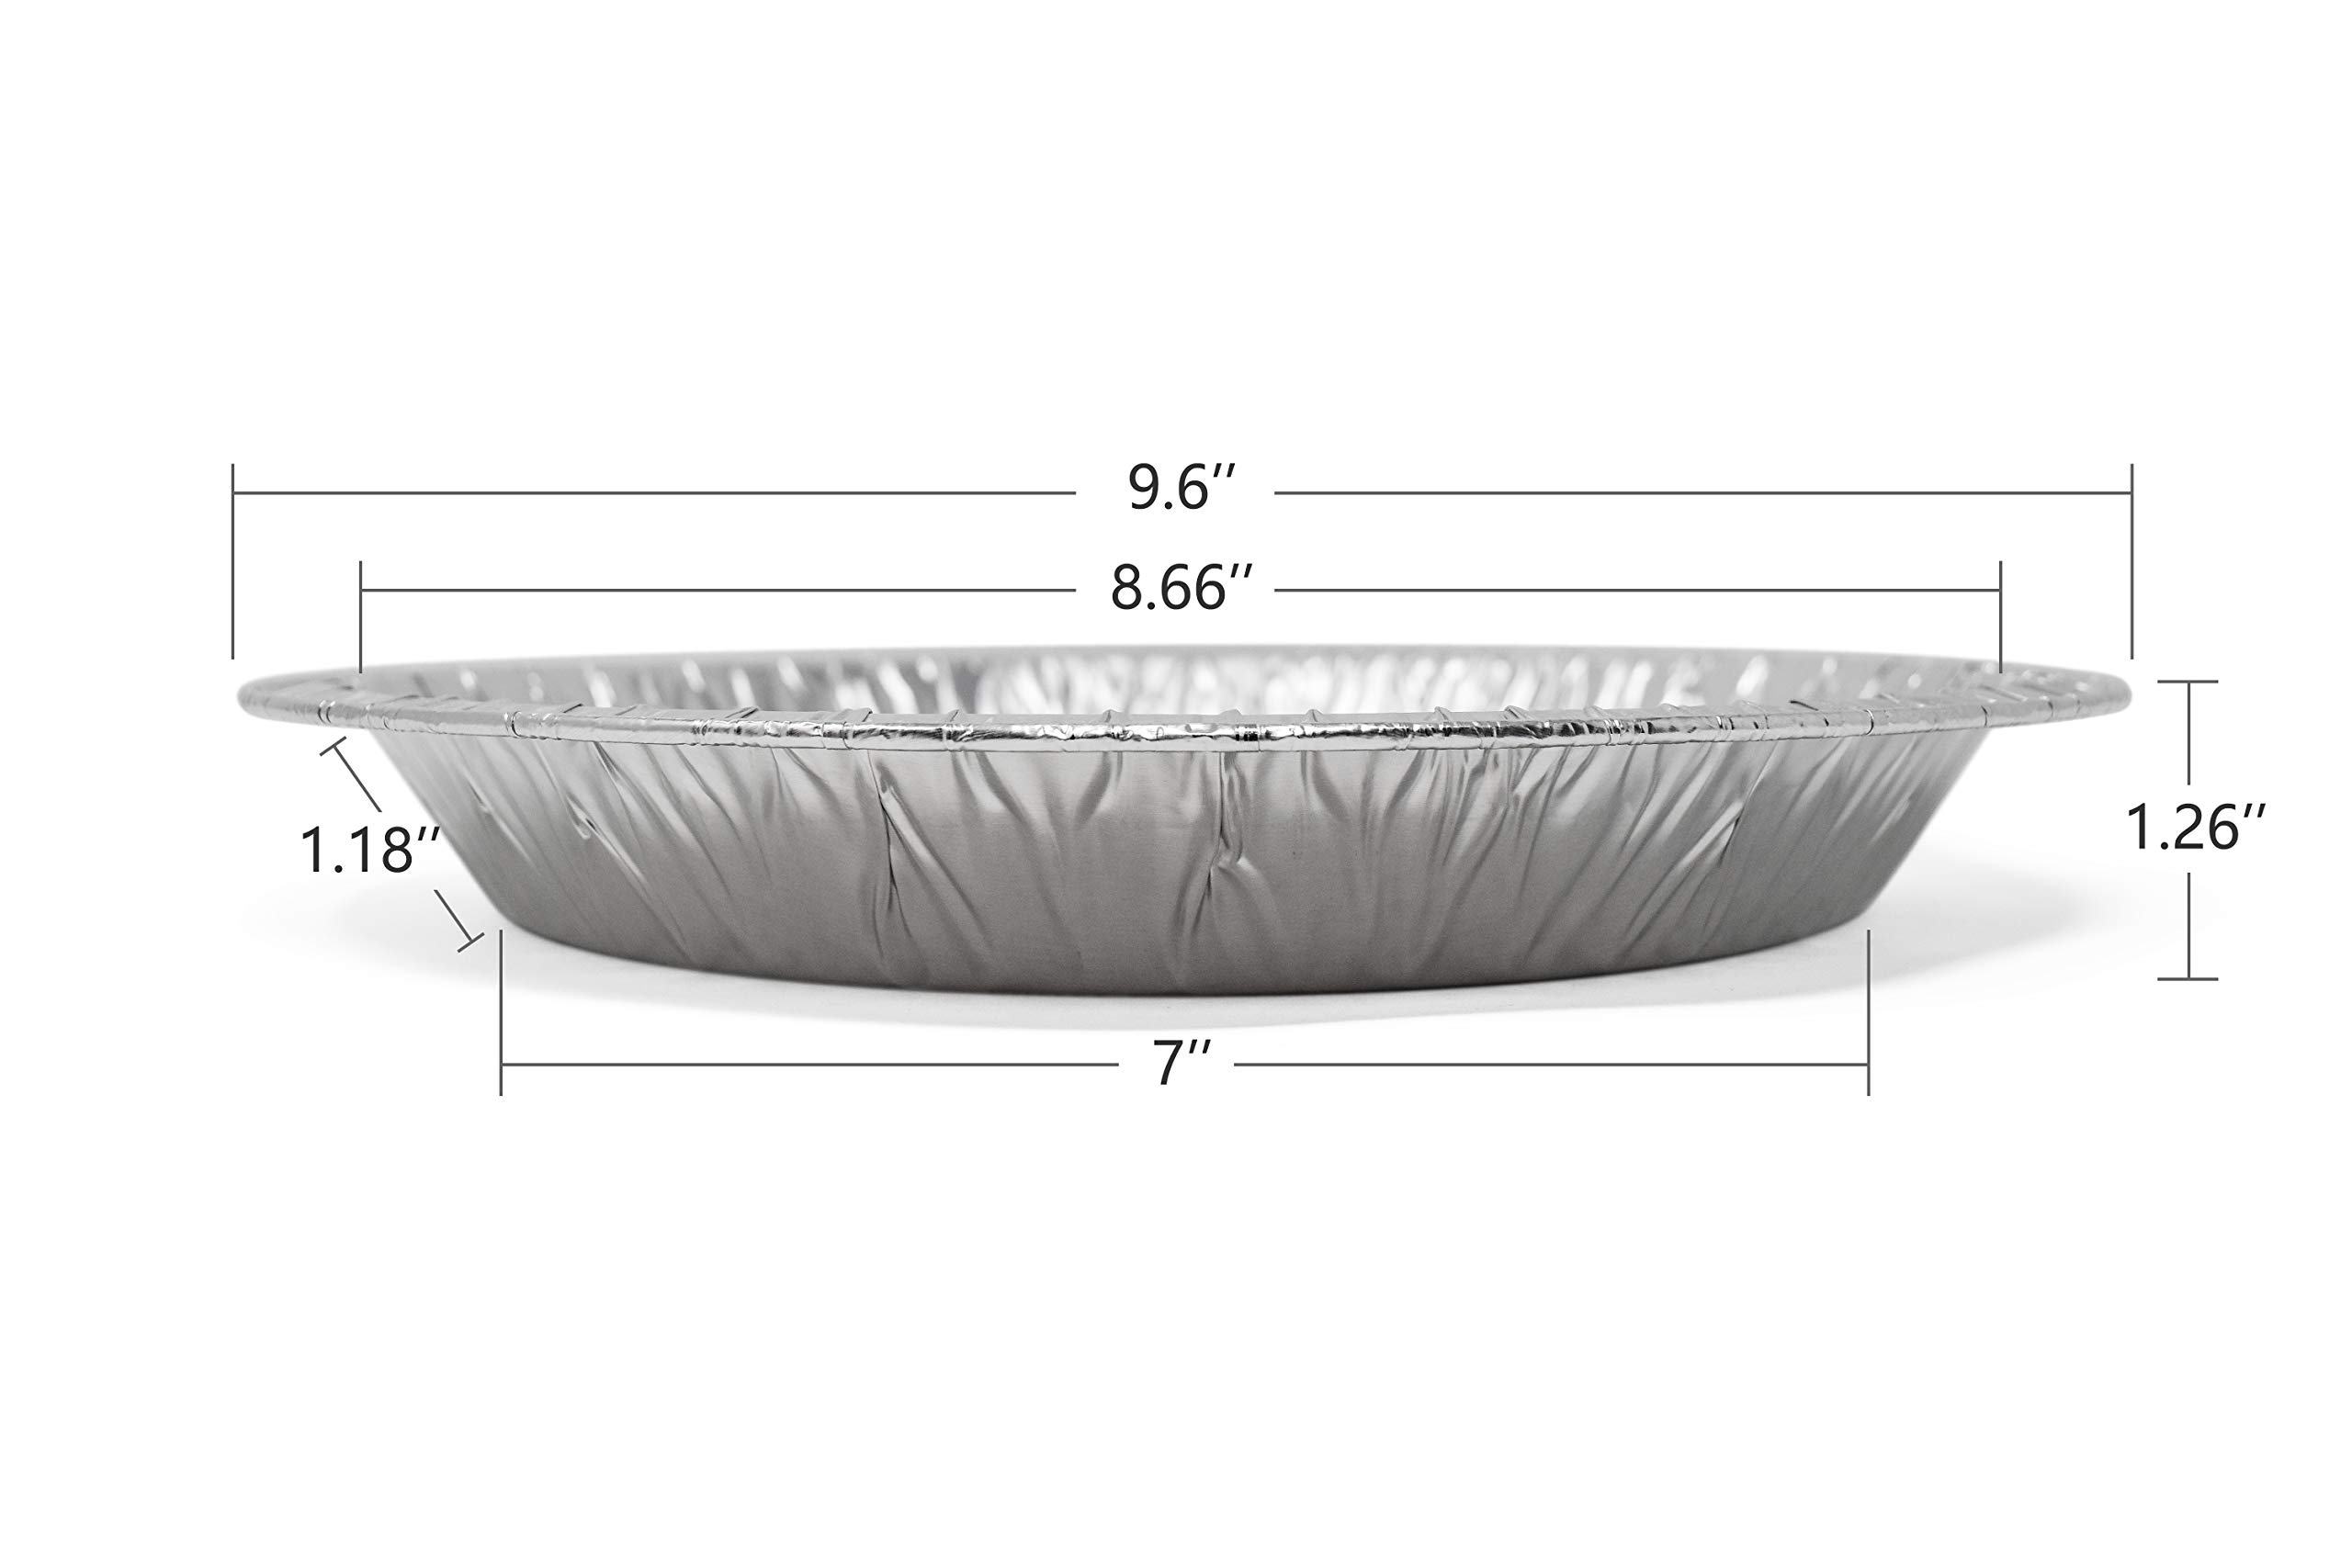 Fig & Leaf (120 Pack) Premium 9-Inch Pie Pans l 36 Gauge l Disposable Tart Pan Tin Plates Aluminum Foil for Baking Quiche by Fig & Leaf (Image #2)